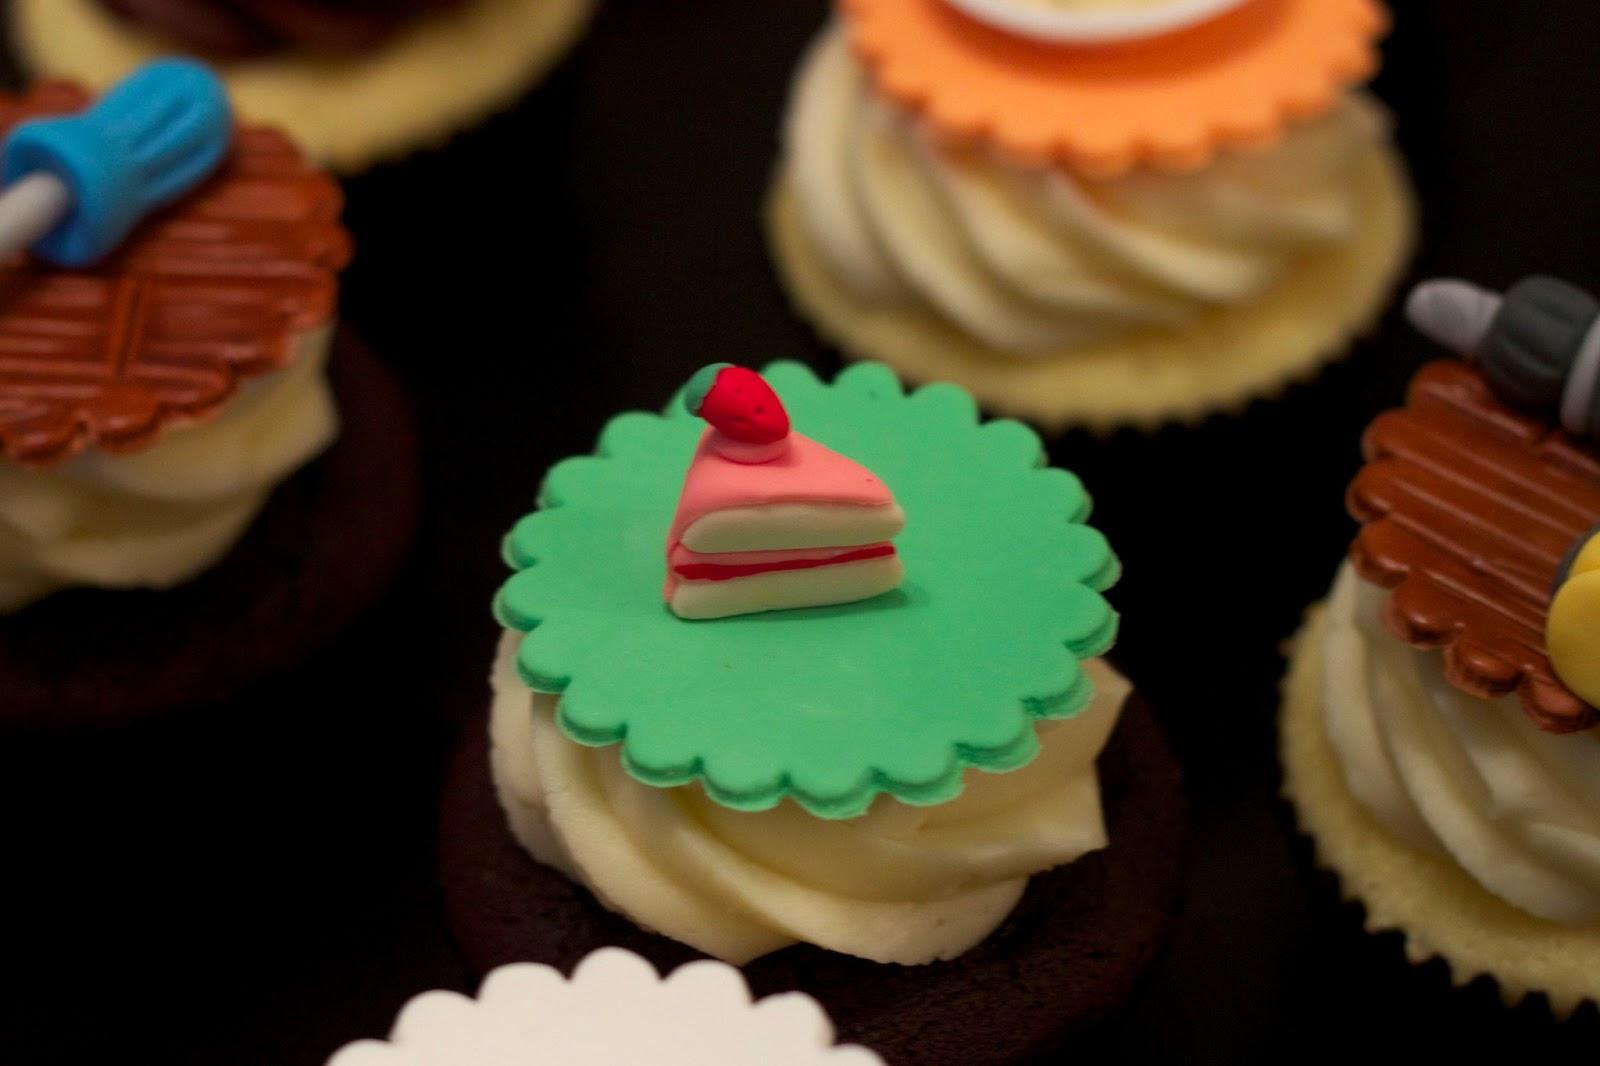 Cake Decorating Tools For Arthritis